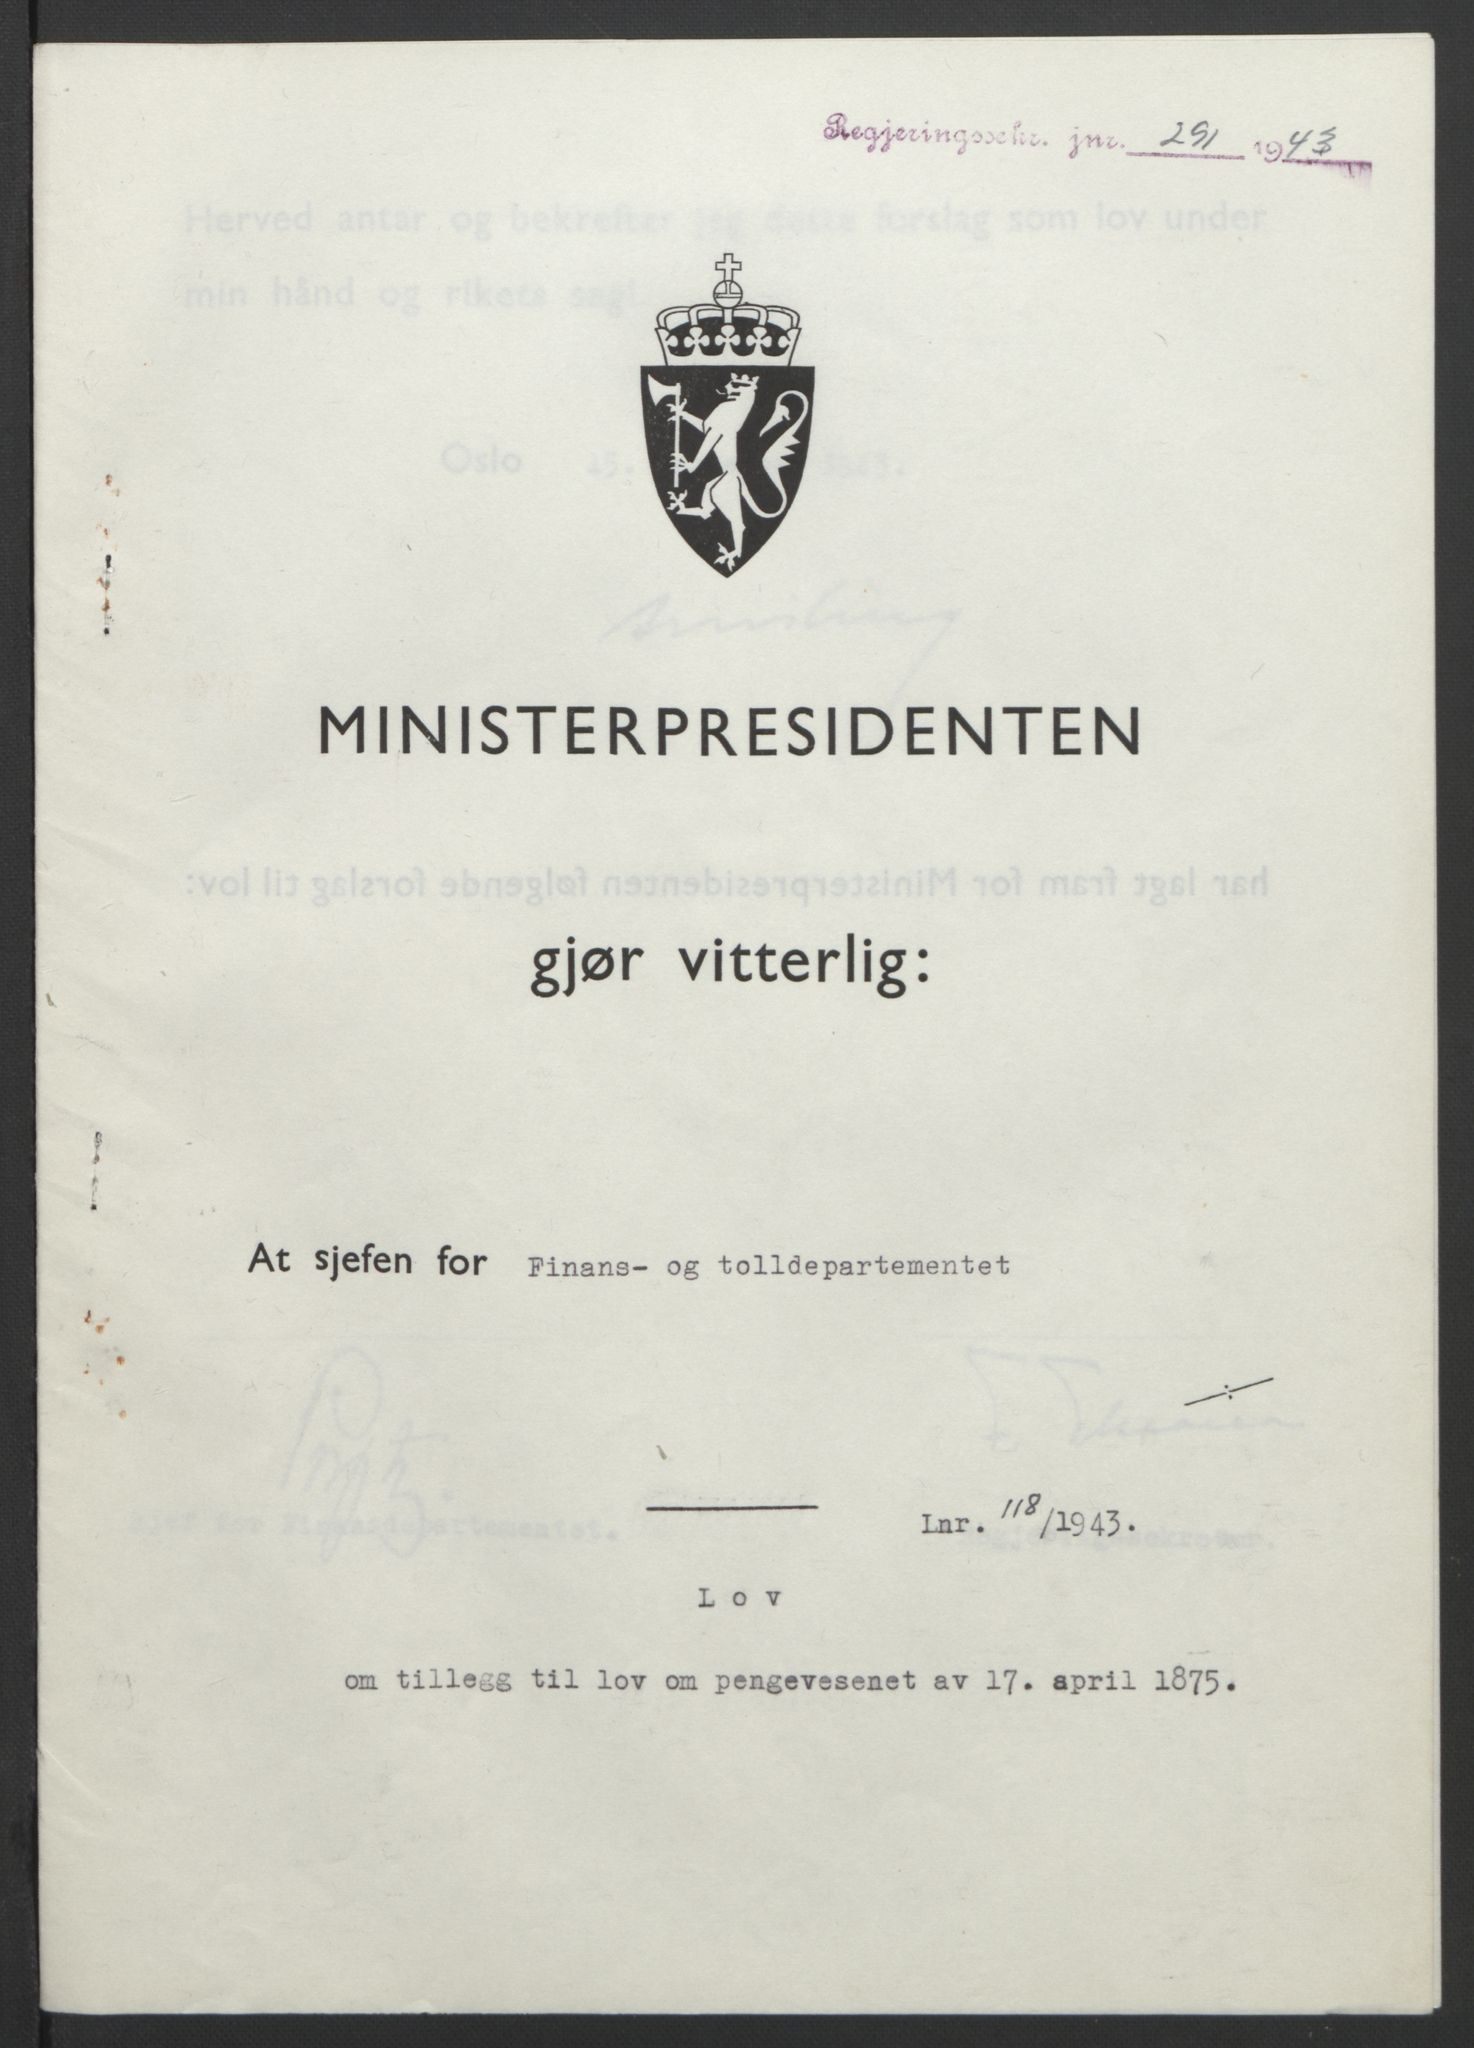 RA, NS-administrasjonen 1940-1945 (Statsrådsekretariatet, de kommisariske statsråder mm), D/Db/L0099: Lover, 1943, s. 548